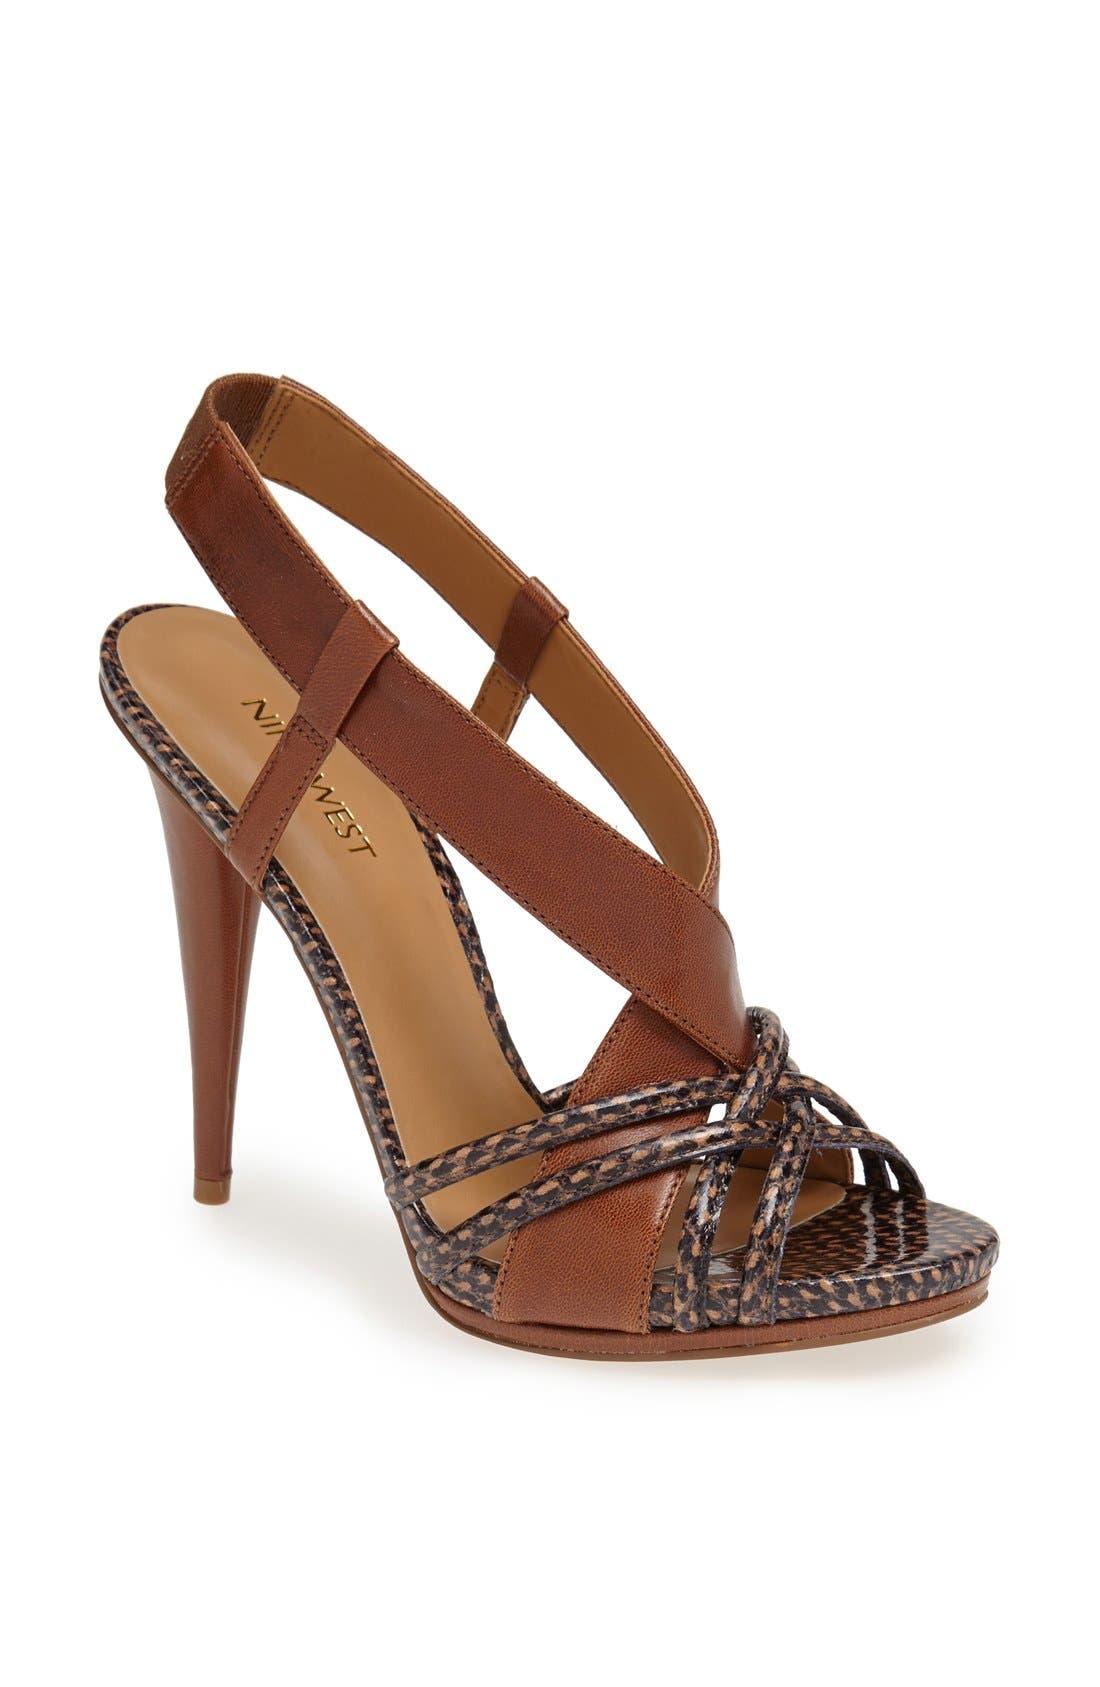 Alternate Image 1 Selected - Nine West 'Allysse' Leather Sandal